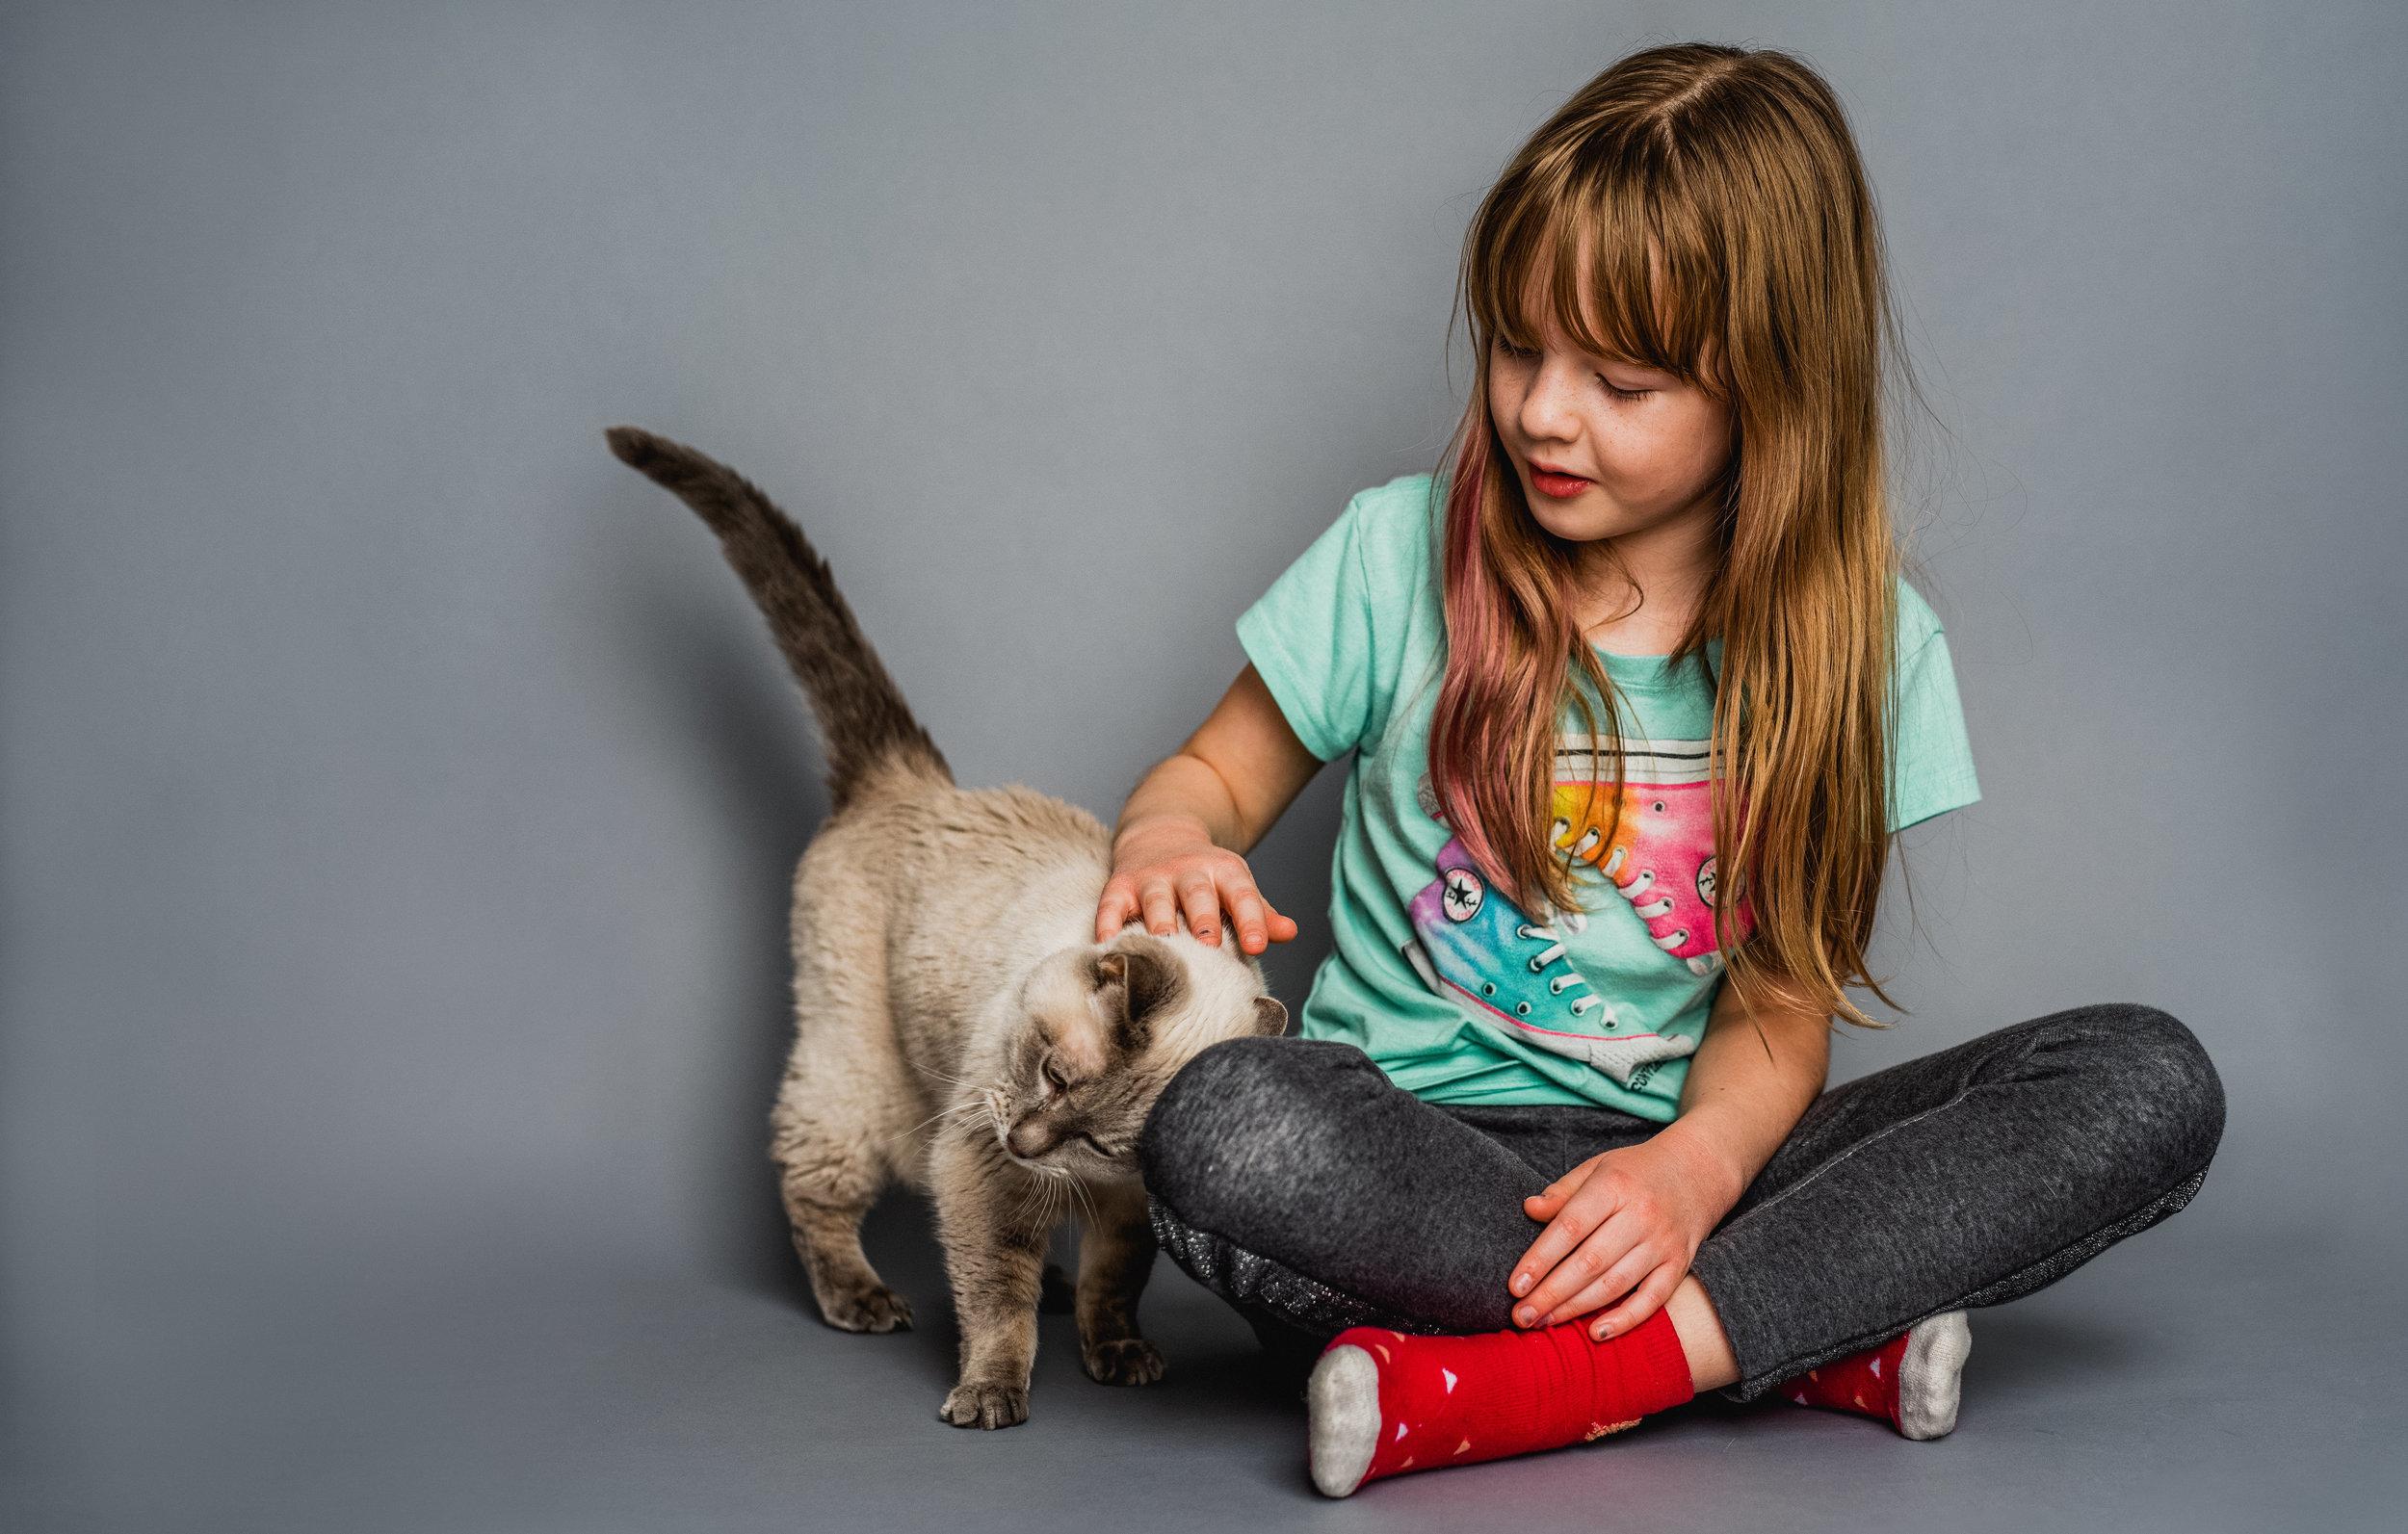 studio portrait of girl with a cat.jpg